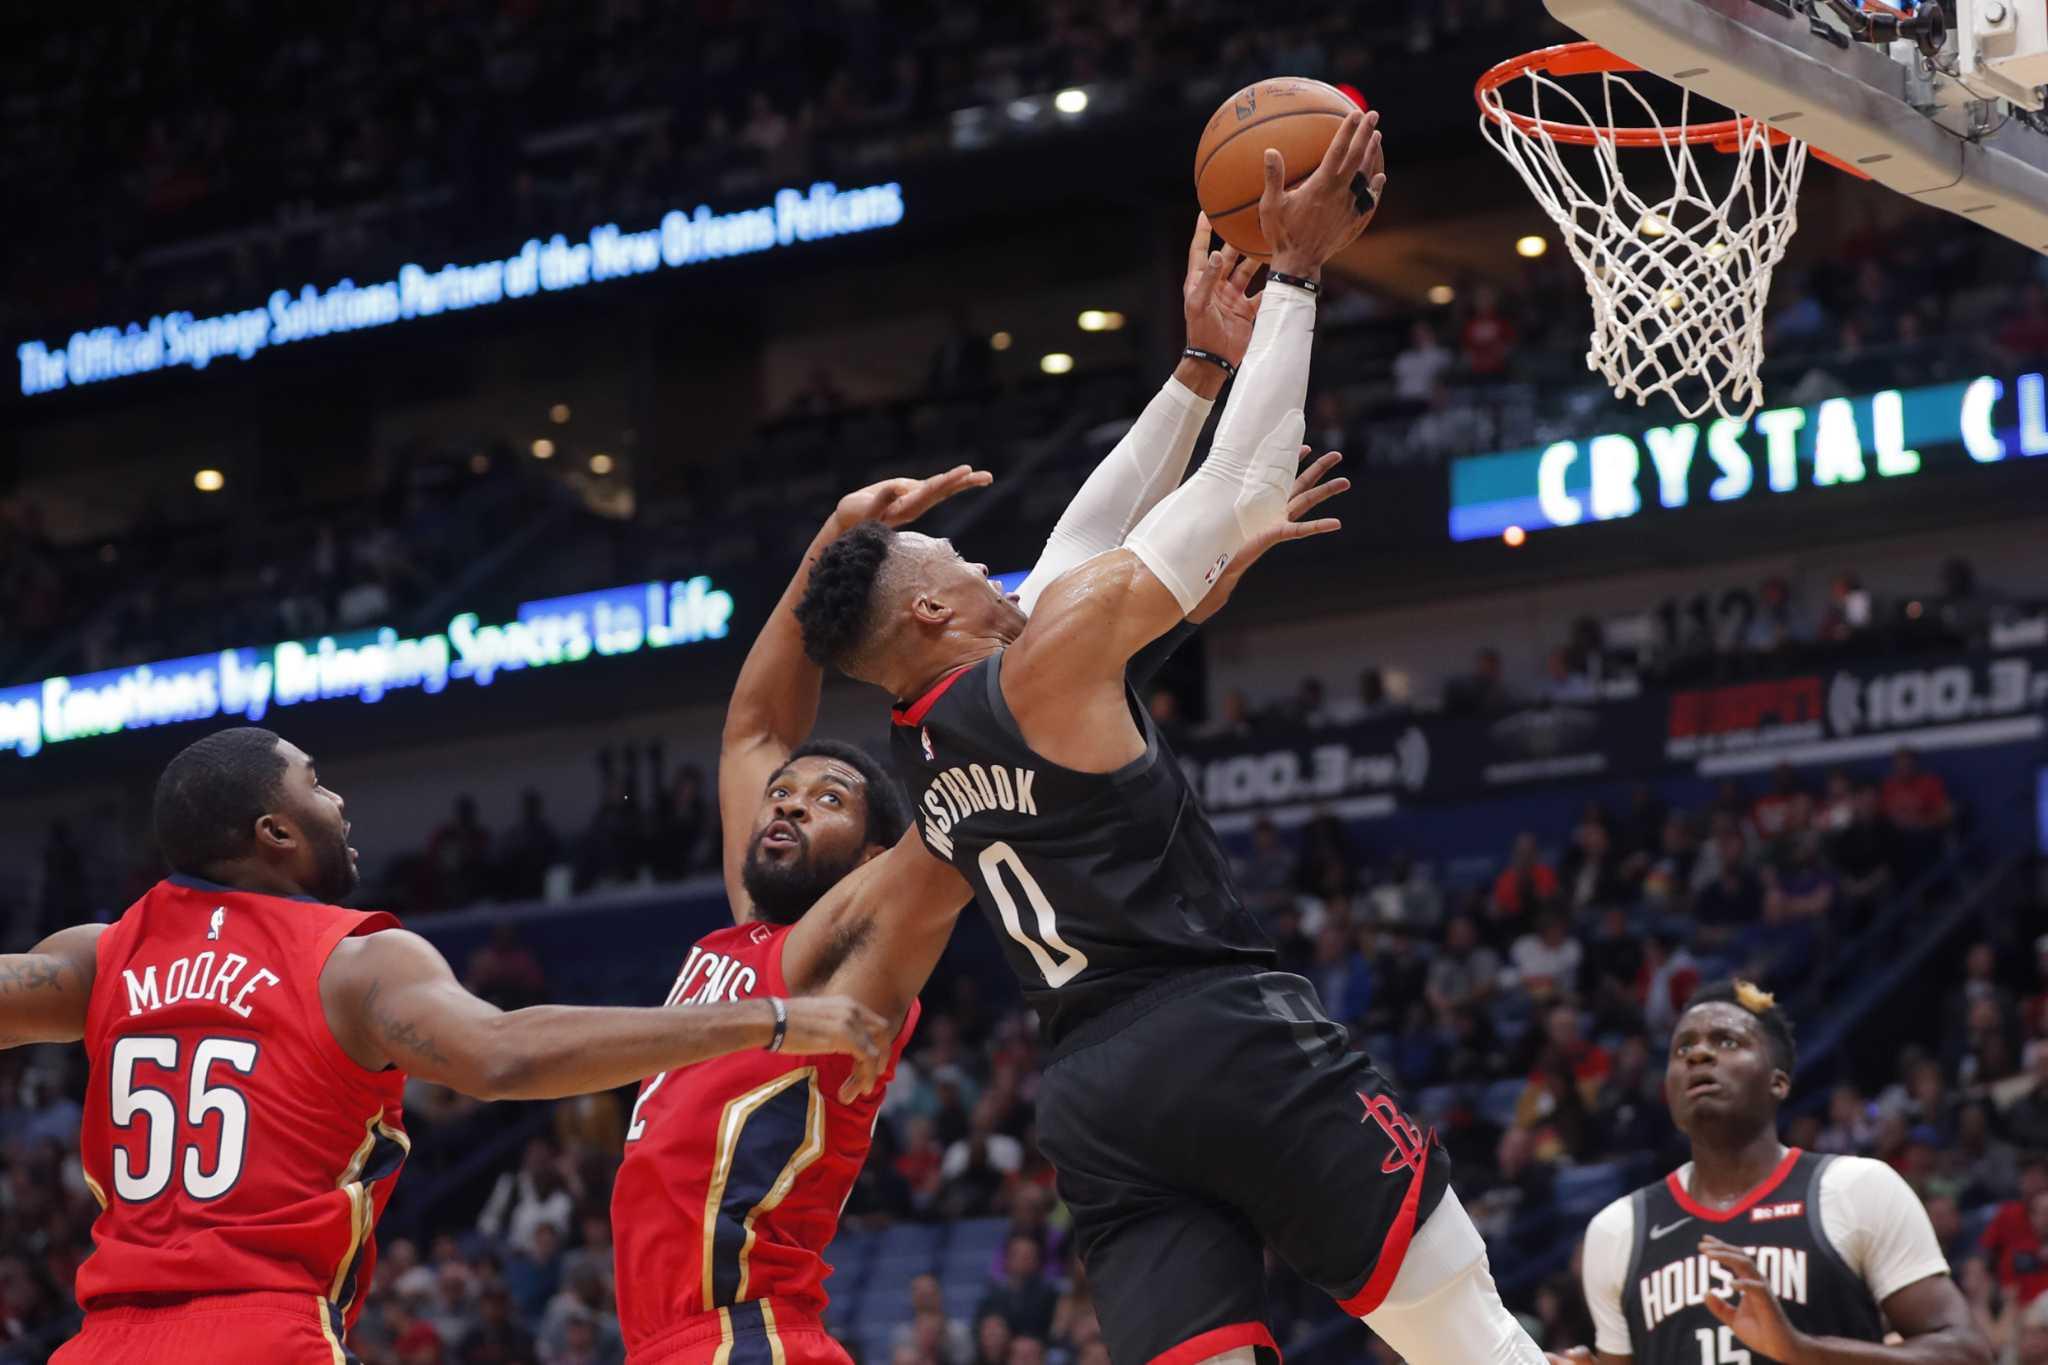 Rockets fend off short-handed Pelicans